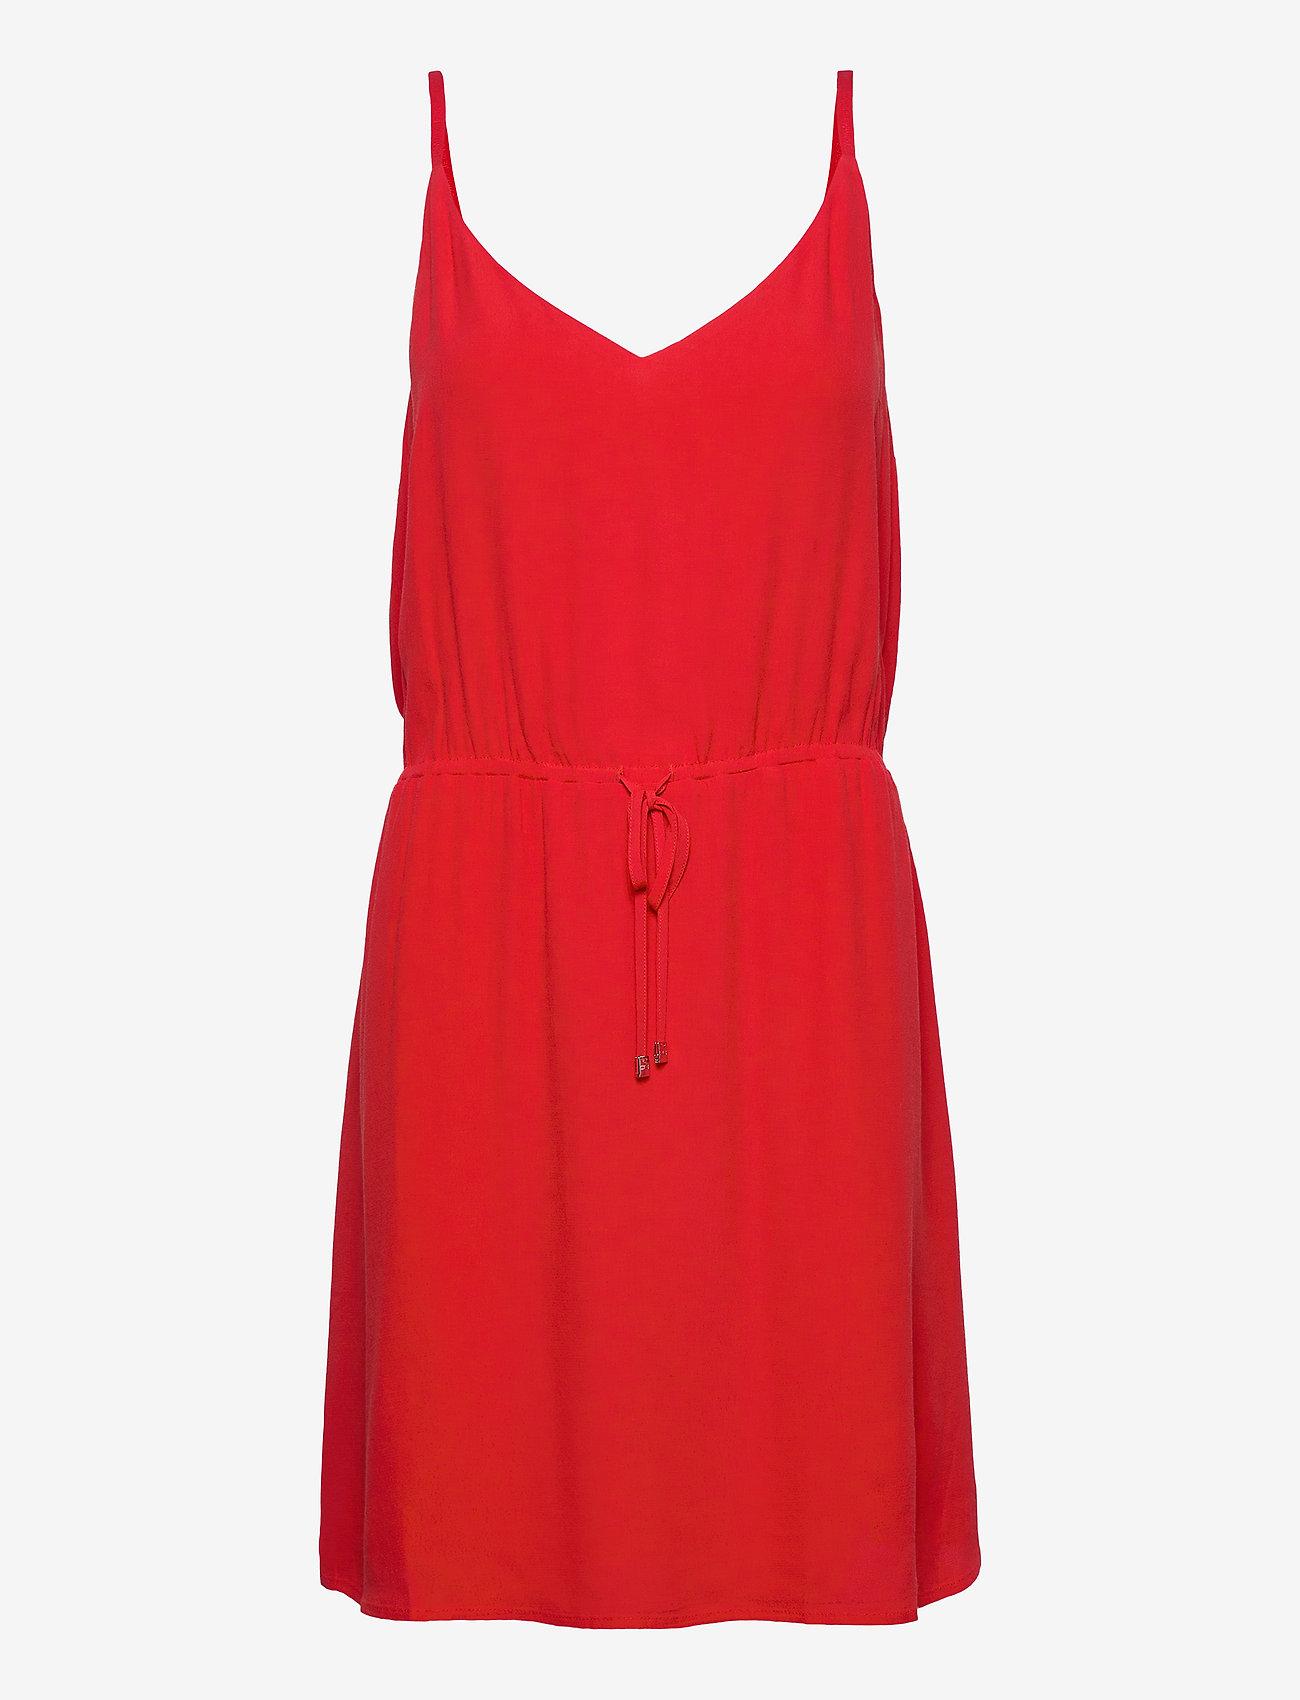 Tommy Jeans - TJW ESSENTIAL STRAP - short dresses - deep crimson - 0